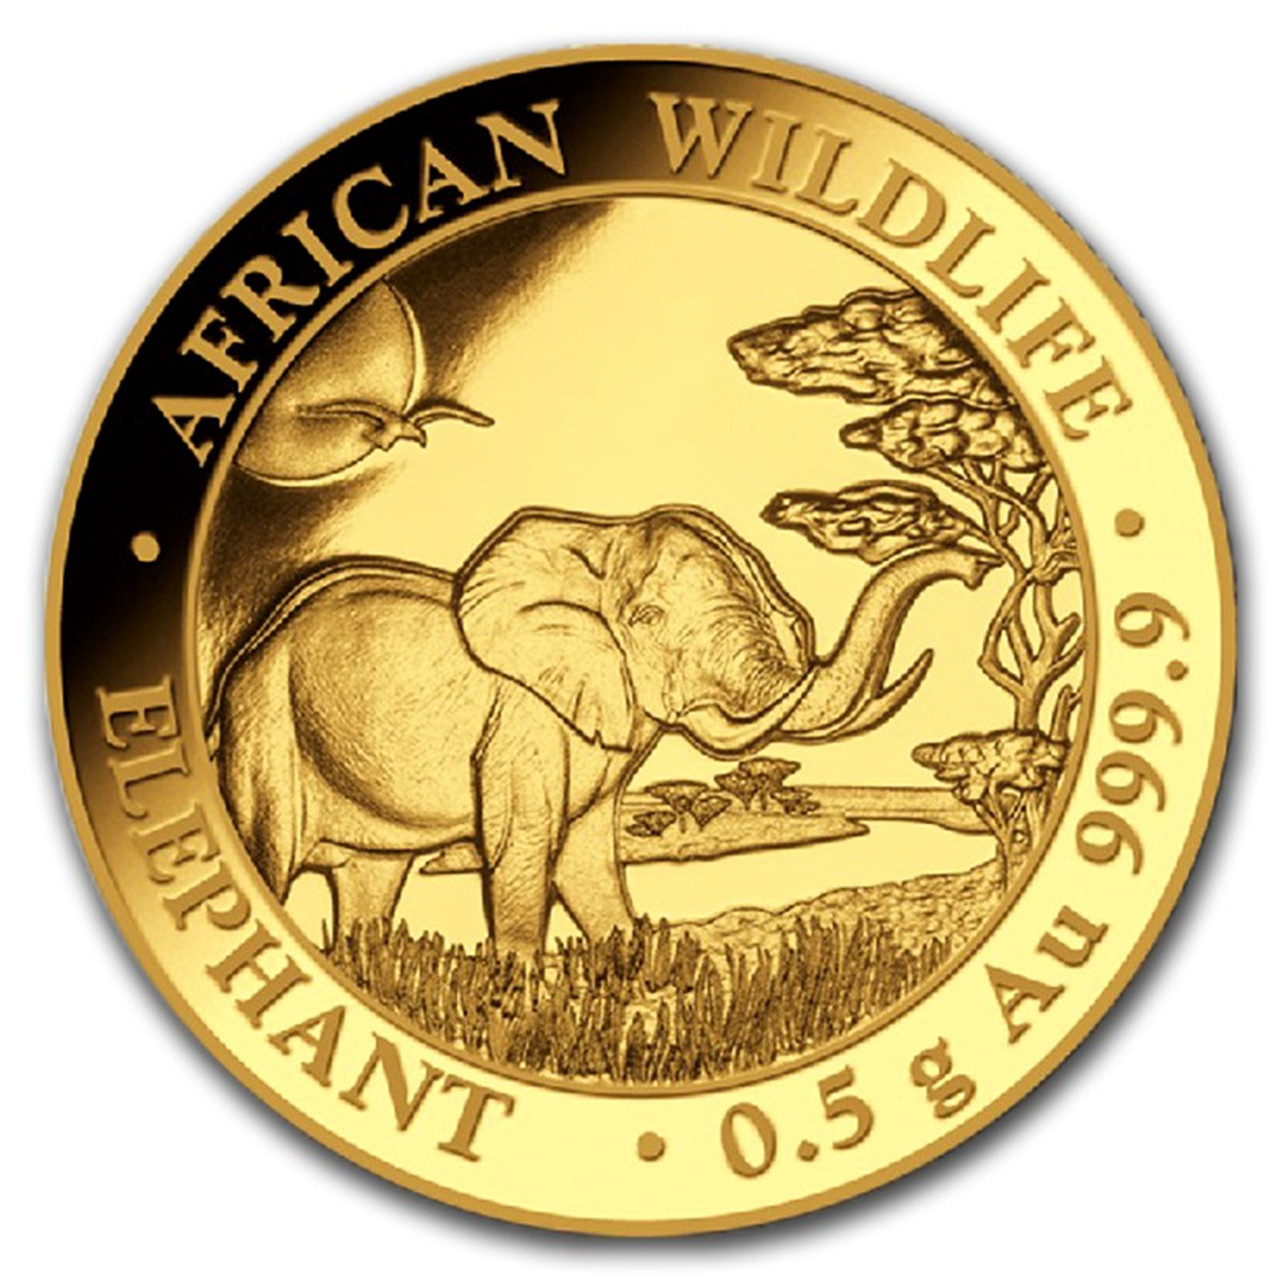 Somalia Leopard 2020 0,5 grams Gold or Elephant somalie